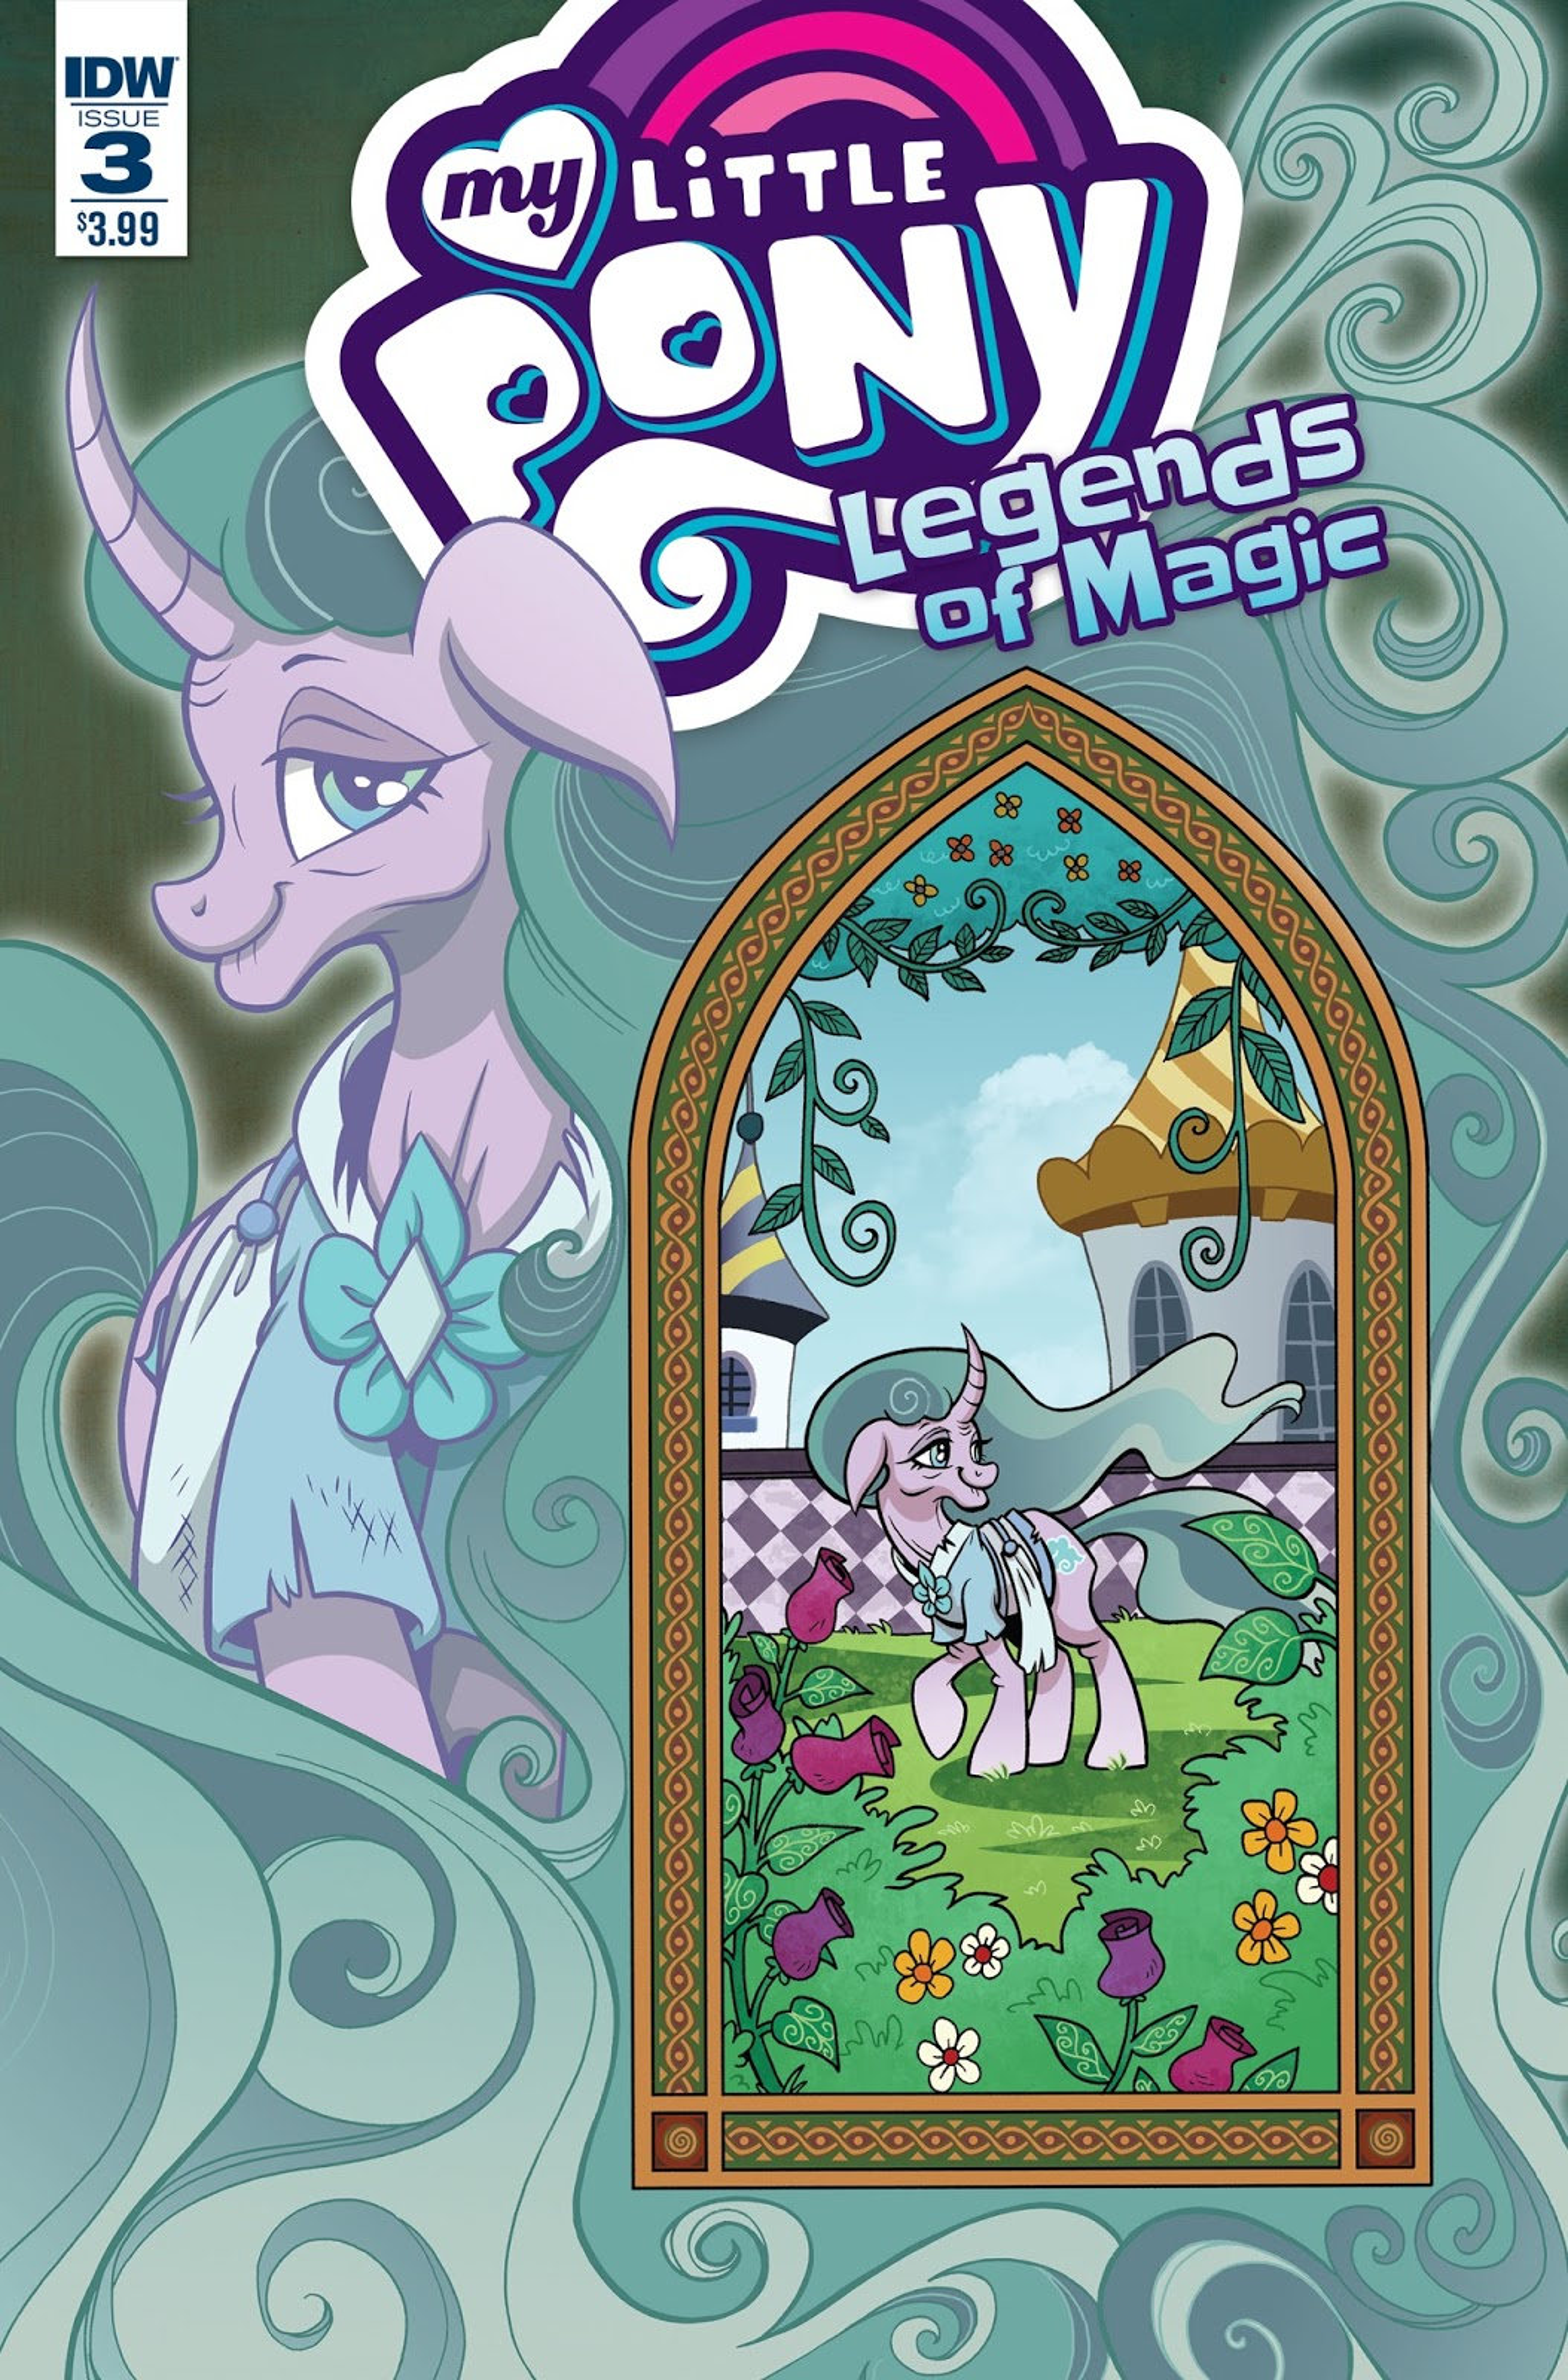 Legends of Magic Issue 3